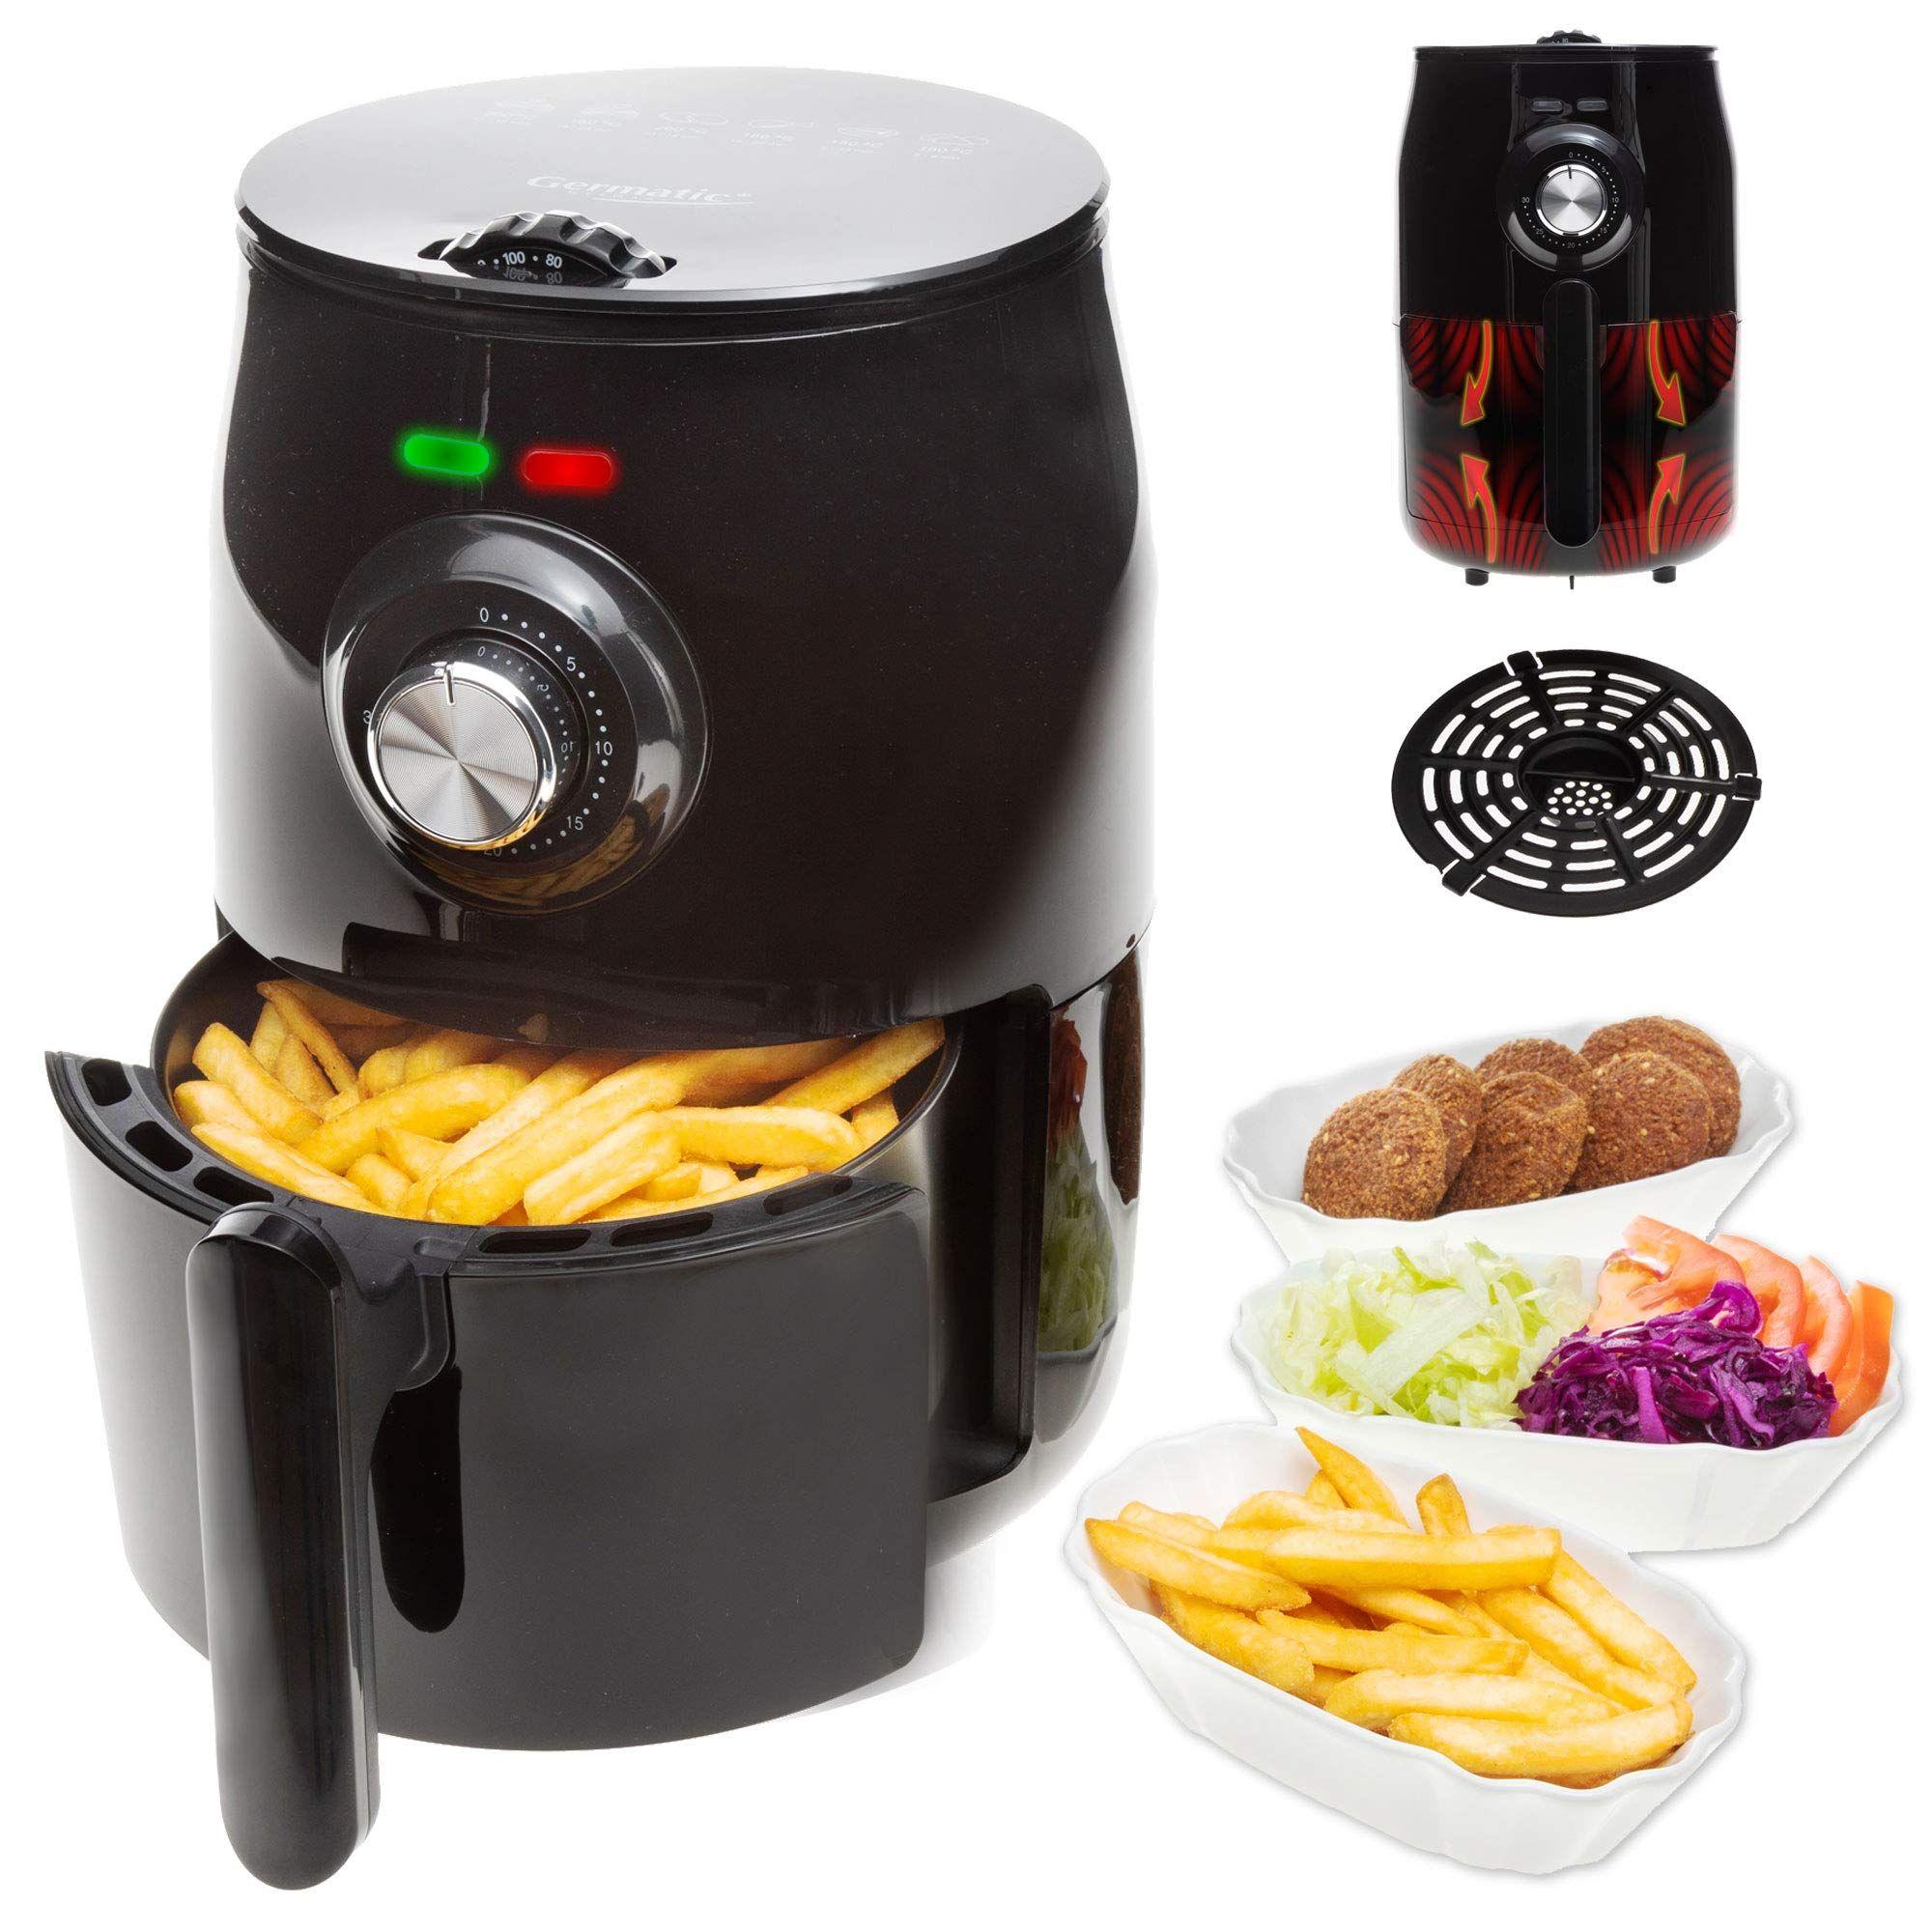 Germatic Heißluftfritteuse Frittieren ohne Öl 1000 Watt ...